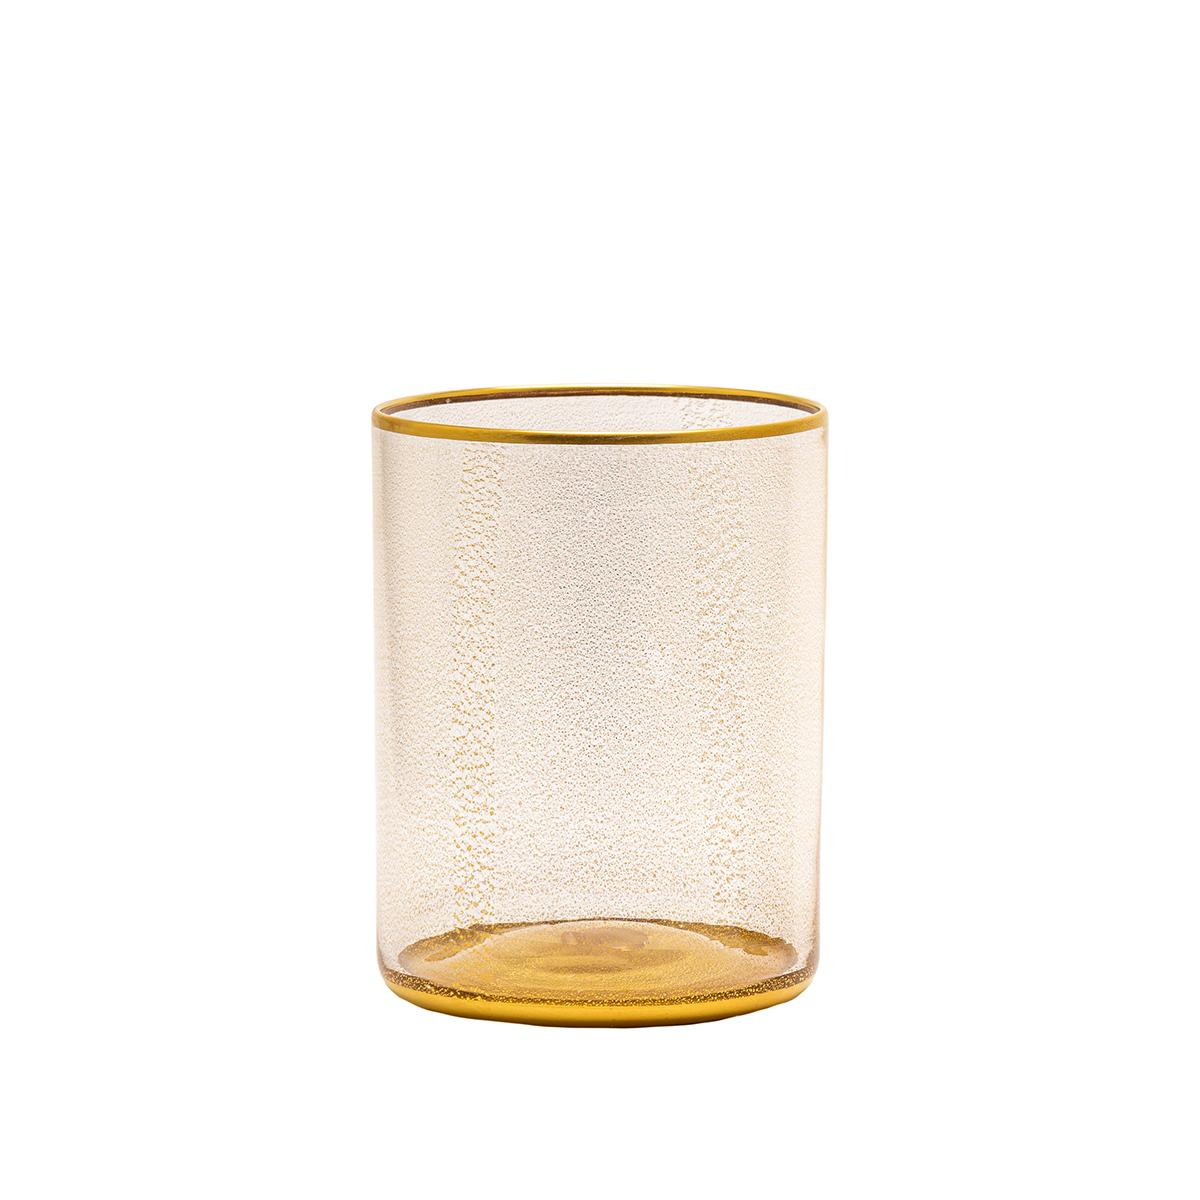 oro-vino-cylindrical-handmade-glassware-luxury-lux-high-end